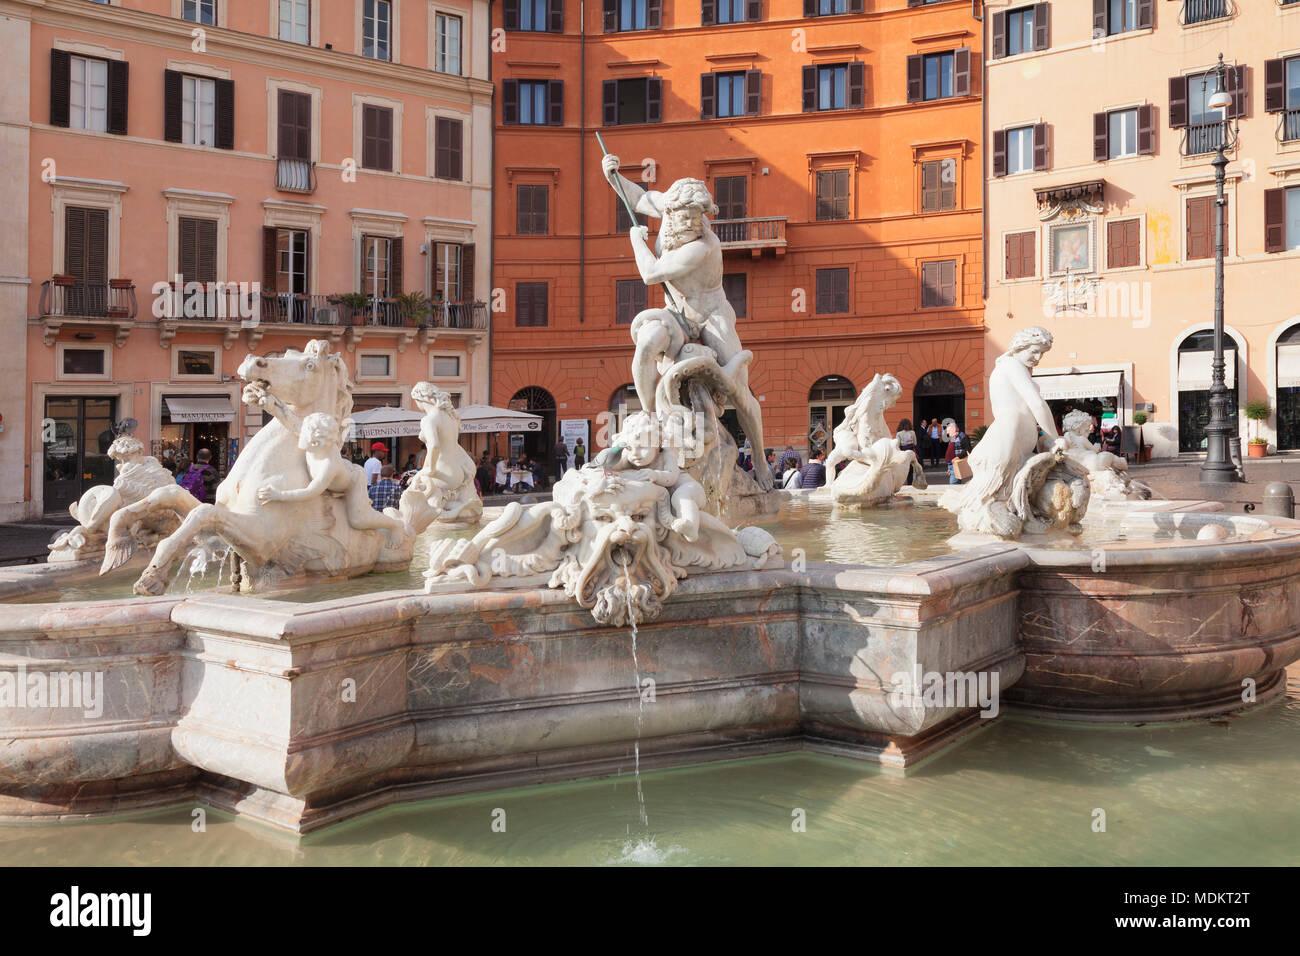 Fontaine de Neptune, Fontana del Nettuno, Piazza Navona, Rome, Latium, Italie Photo Stock